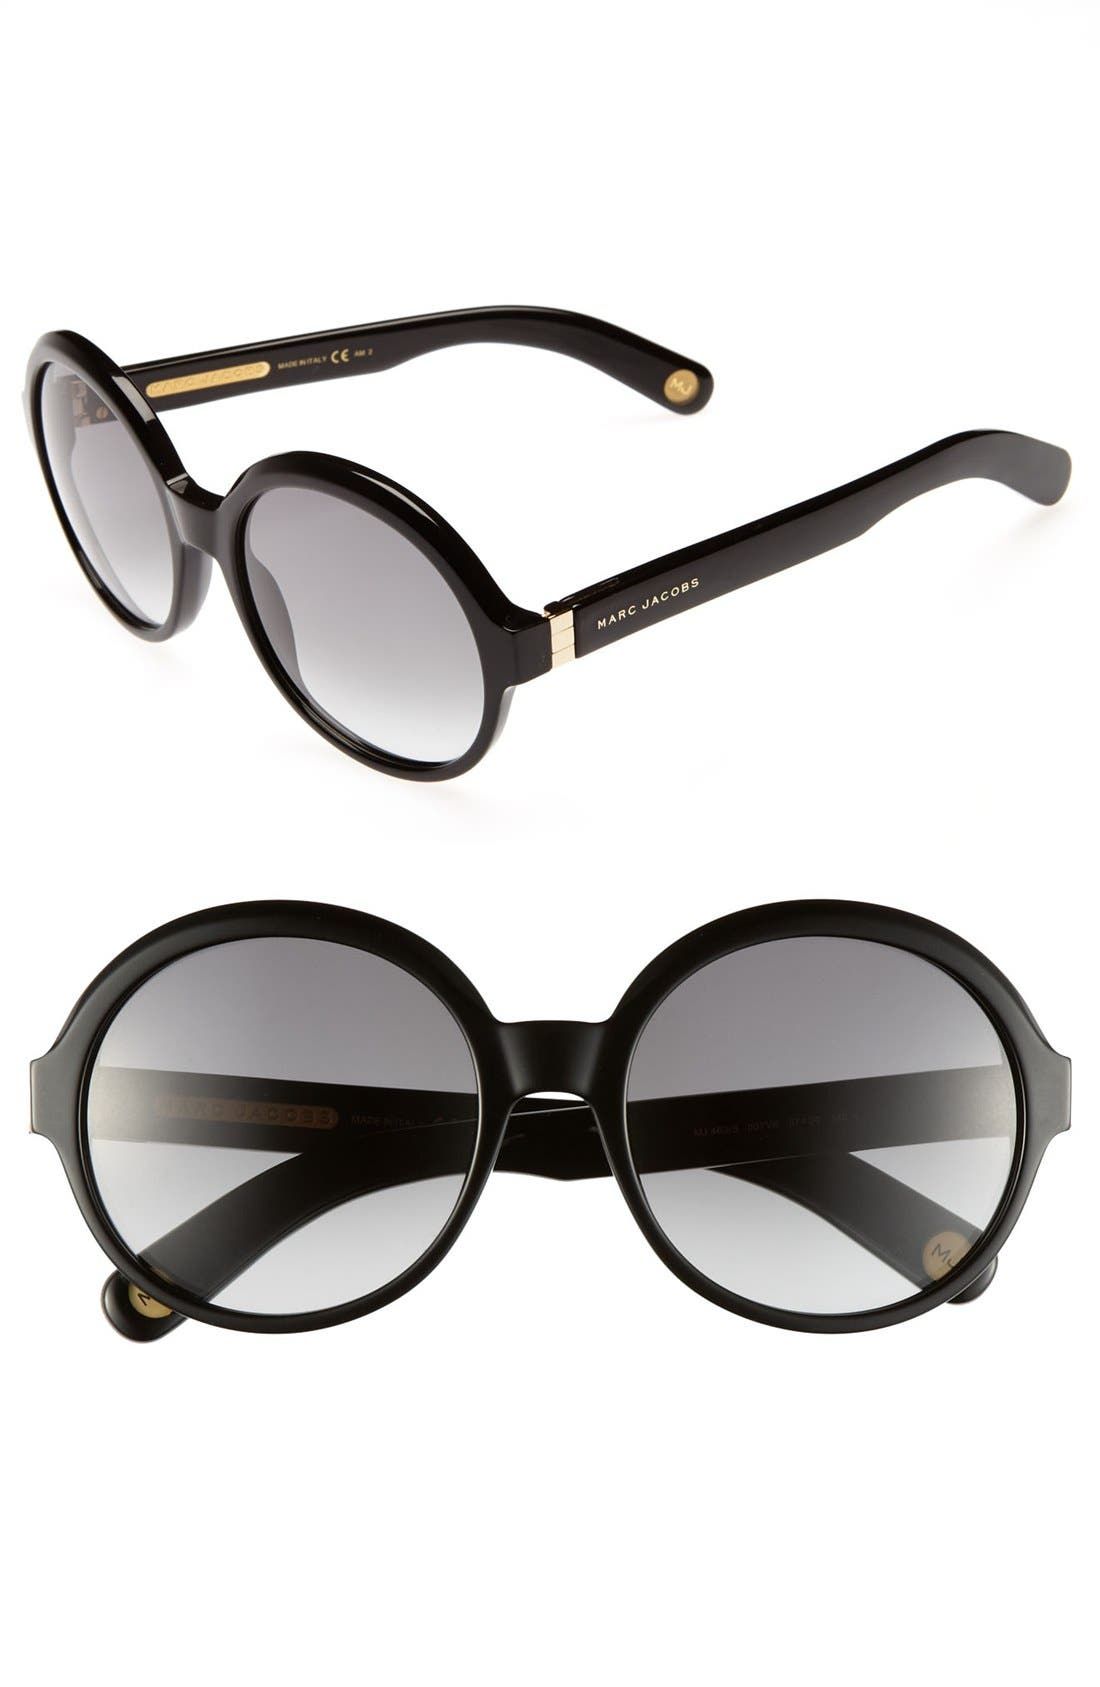 Alternate Image 1 Selected - MARC JACOBS 57mm Retro Sunglasses